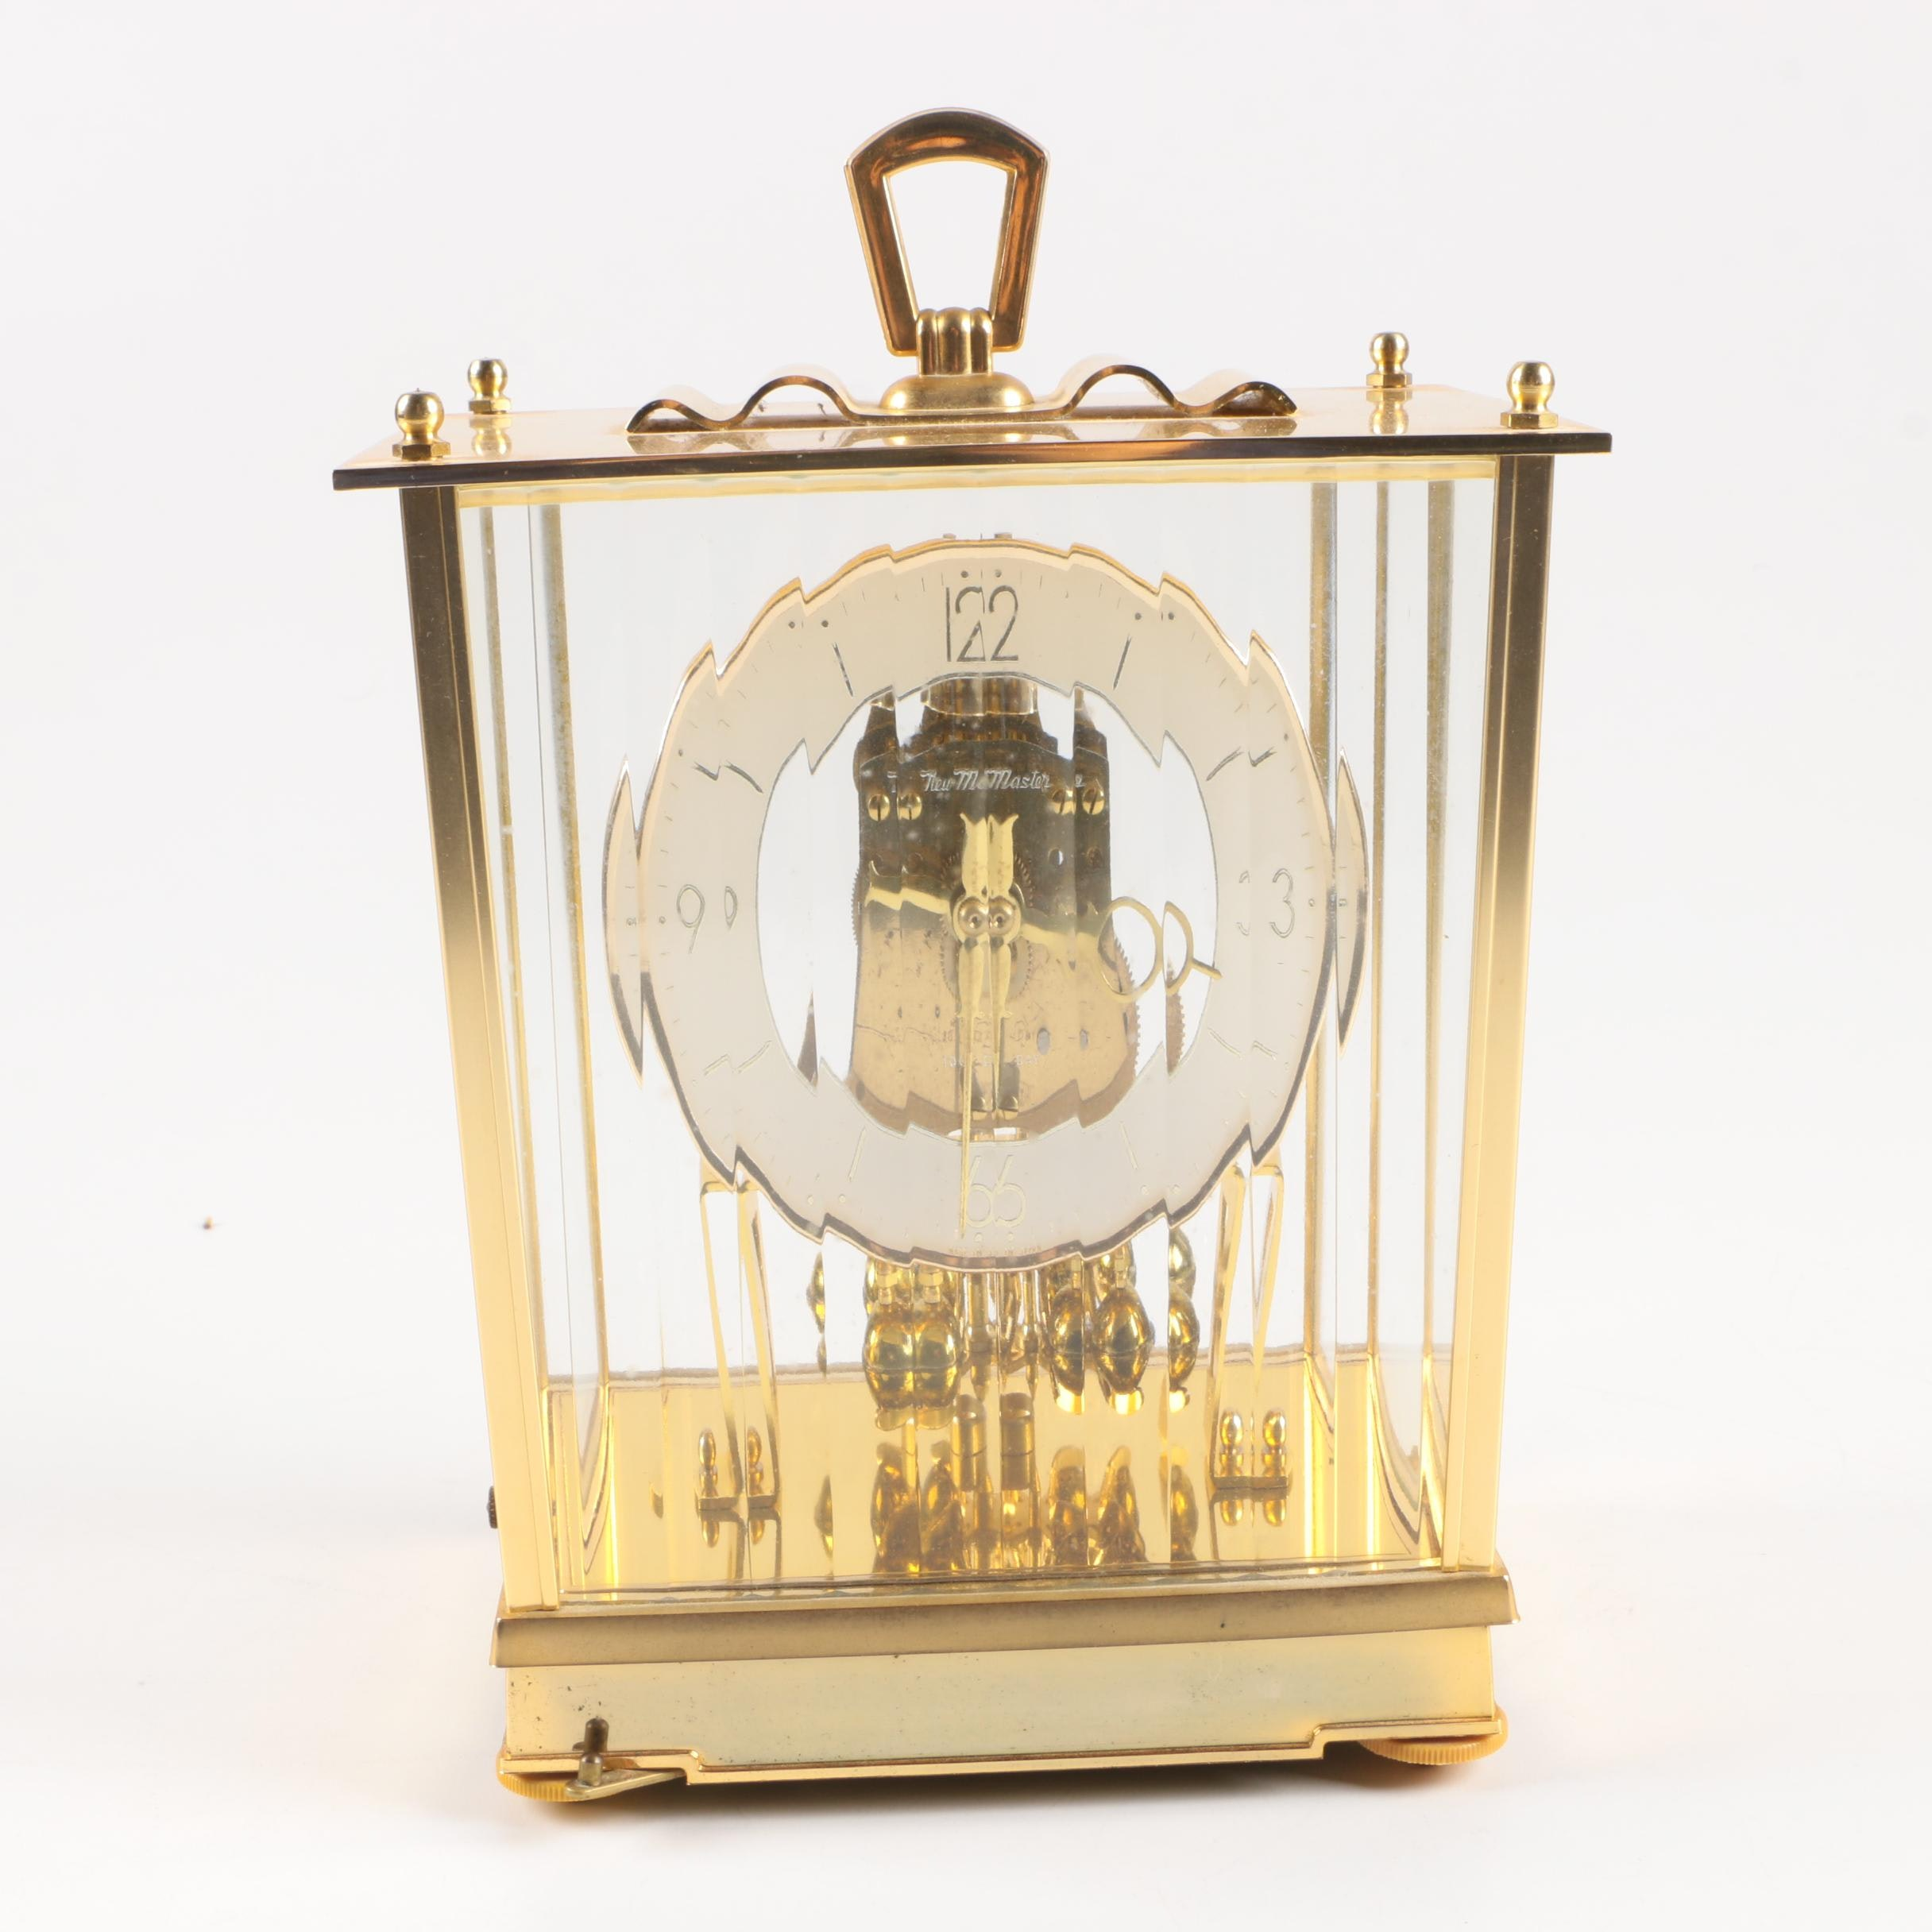 A Nisshin Master Mantle Clock